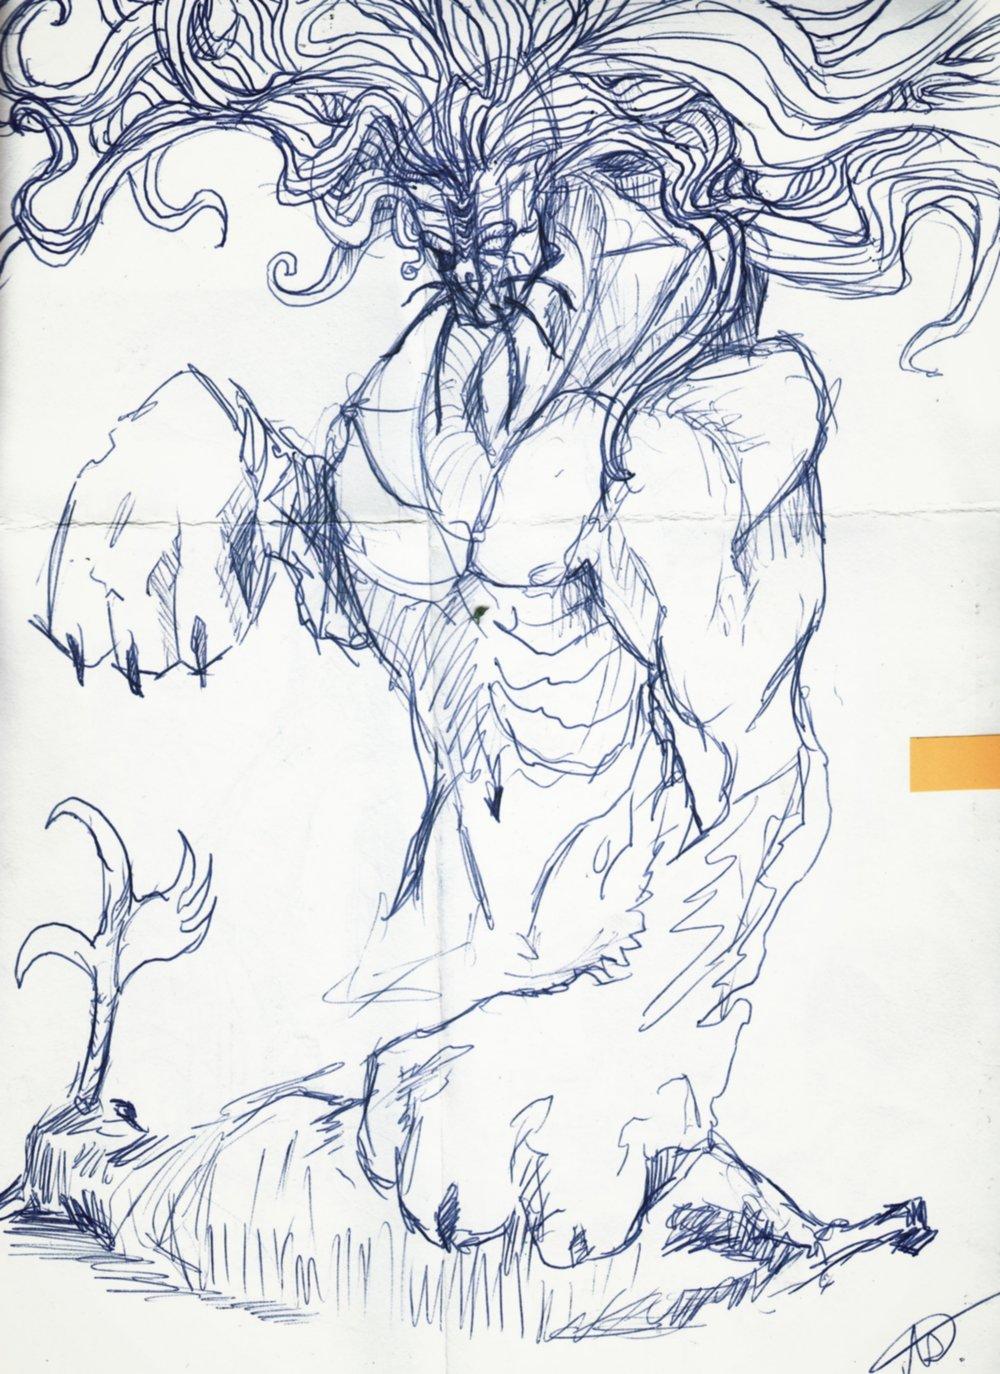 Sketch: Lion's Share